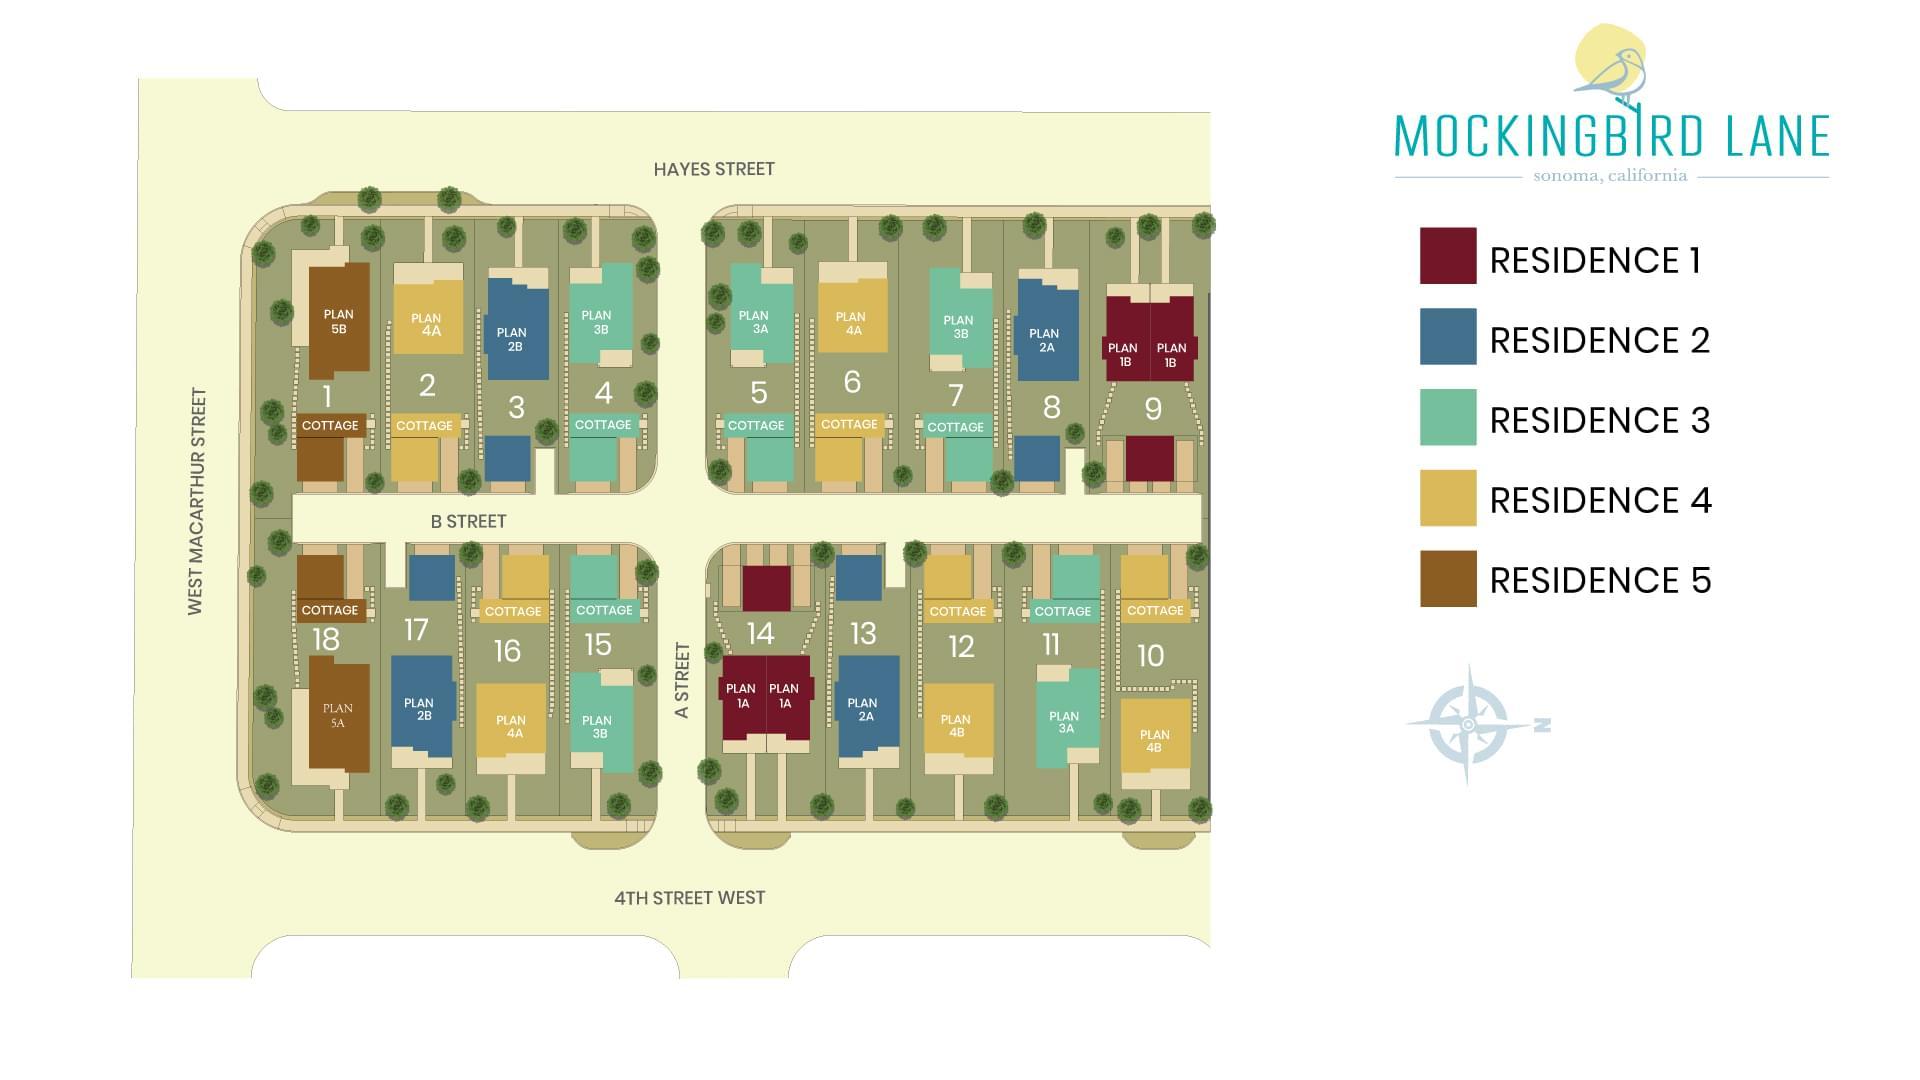 Mockingbird Lane Site Map. Mockingbird Lane New Homes in Sonoma, CA